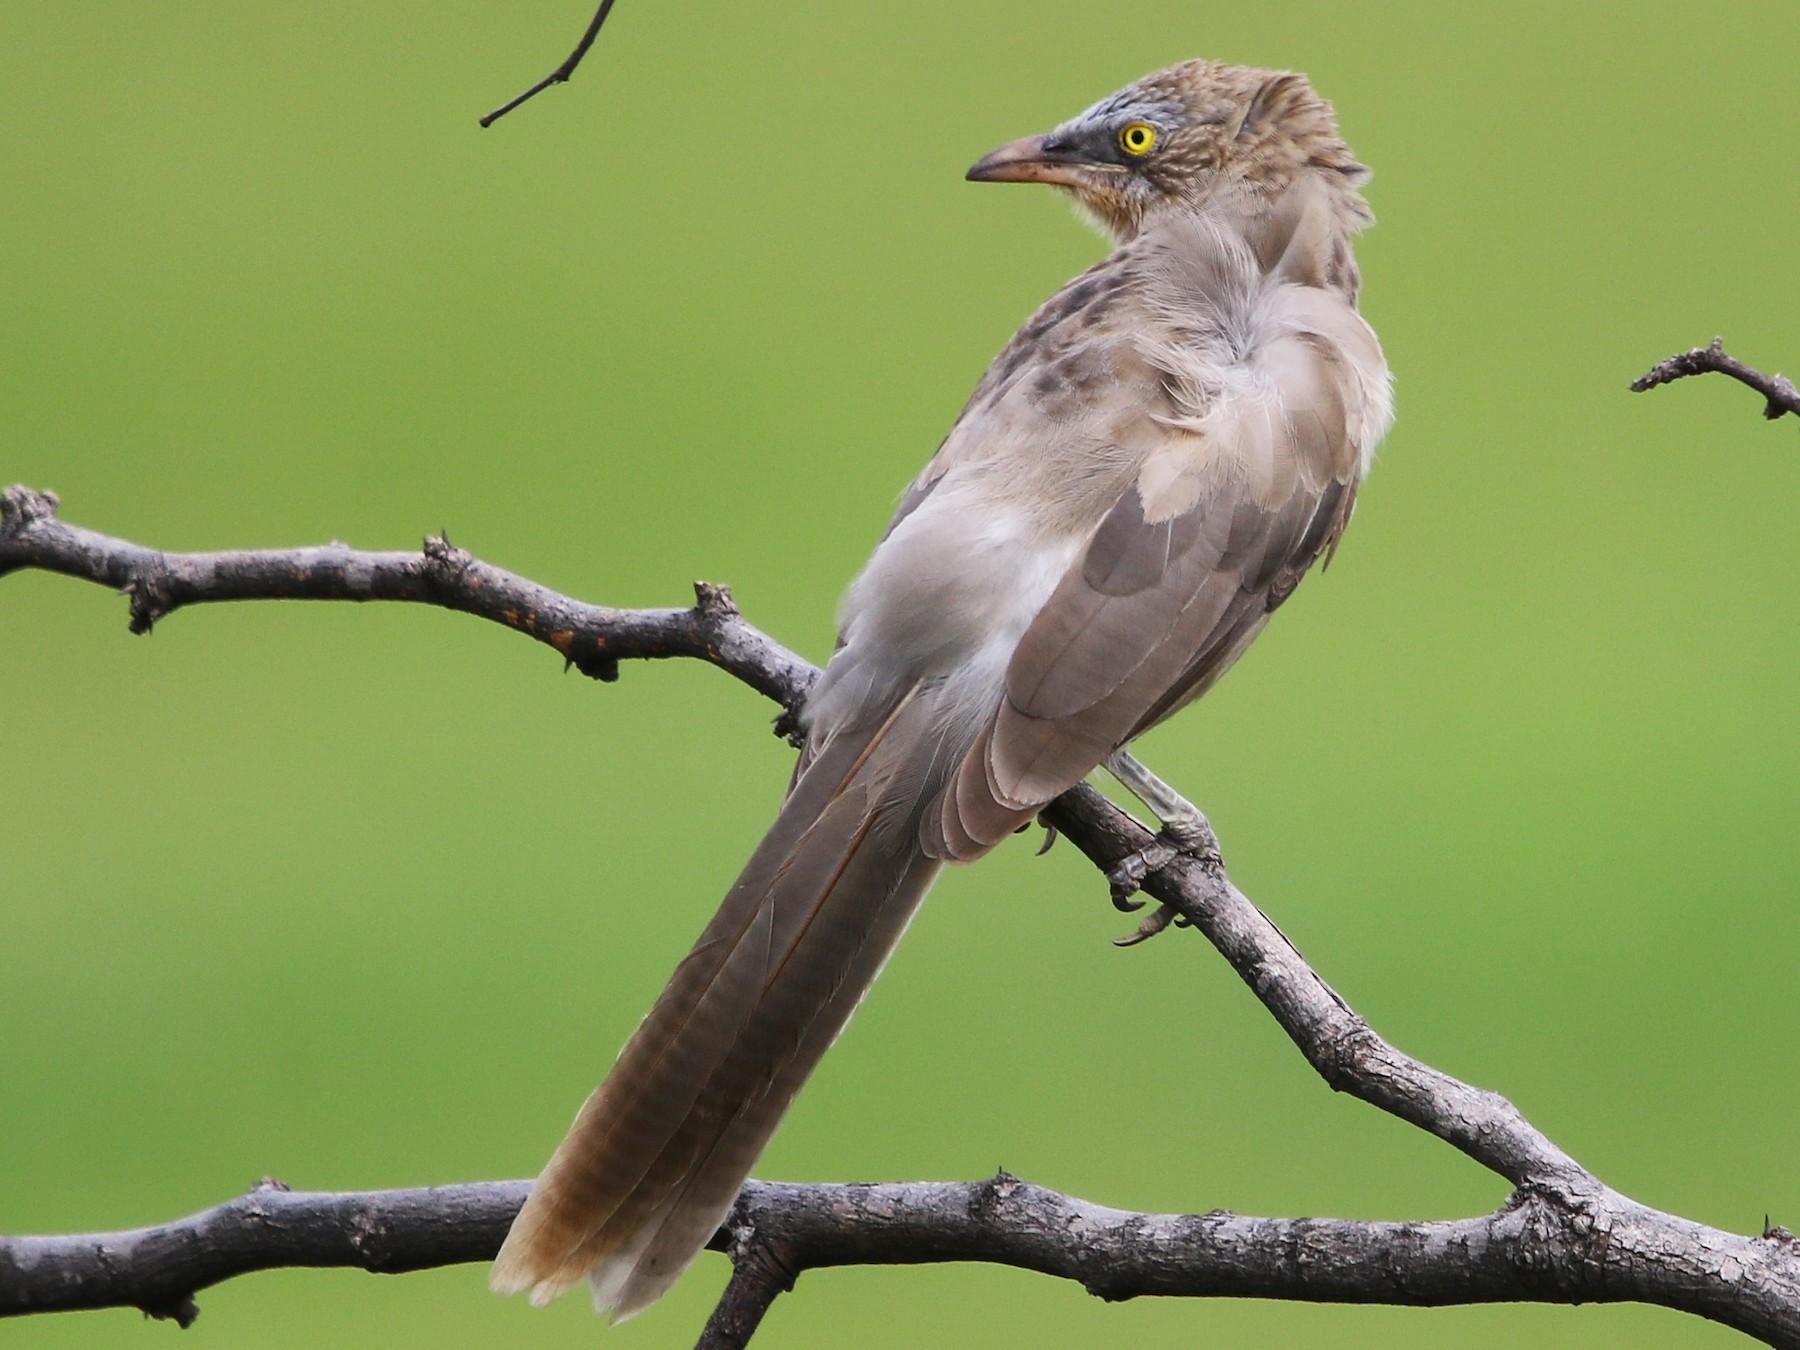 Large Gray Babbler - Bhaarat Vyas